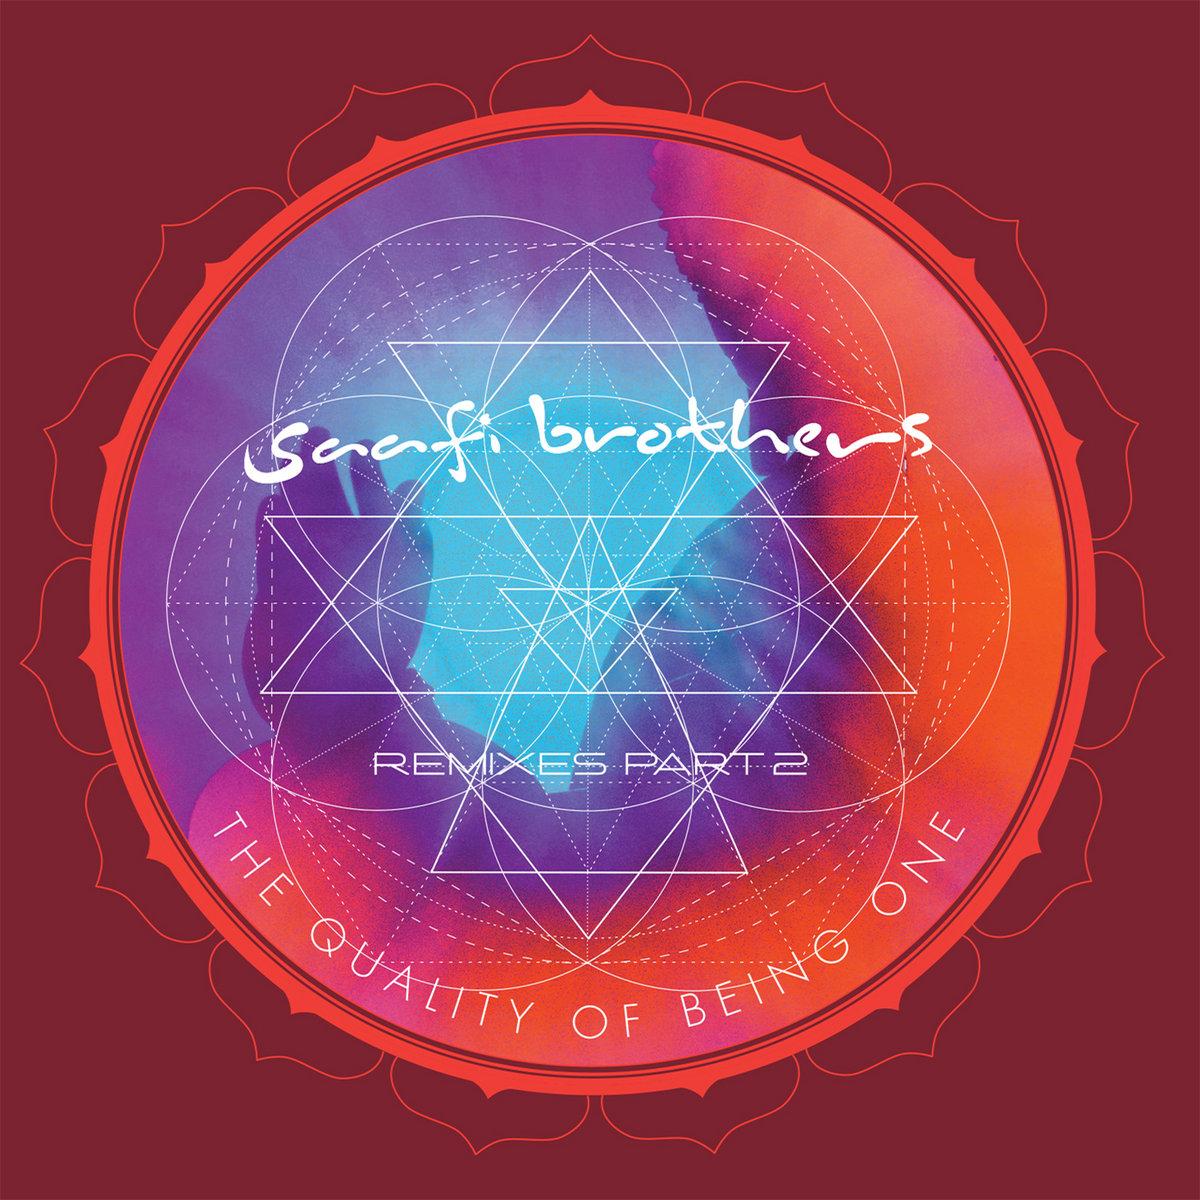 Saafi Brothers - Hippies in Trance – (Erot Remix) | Liquid